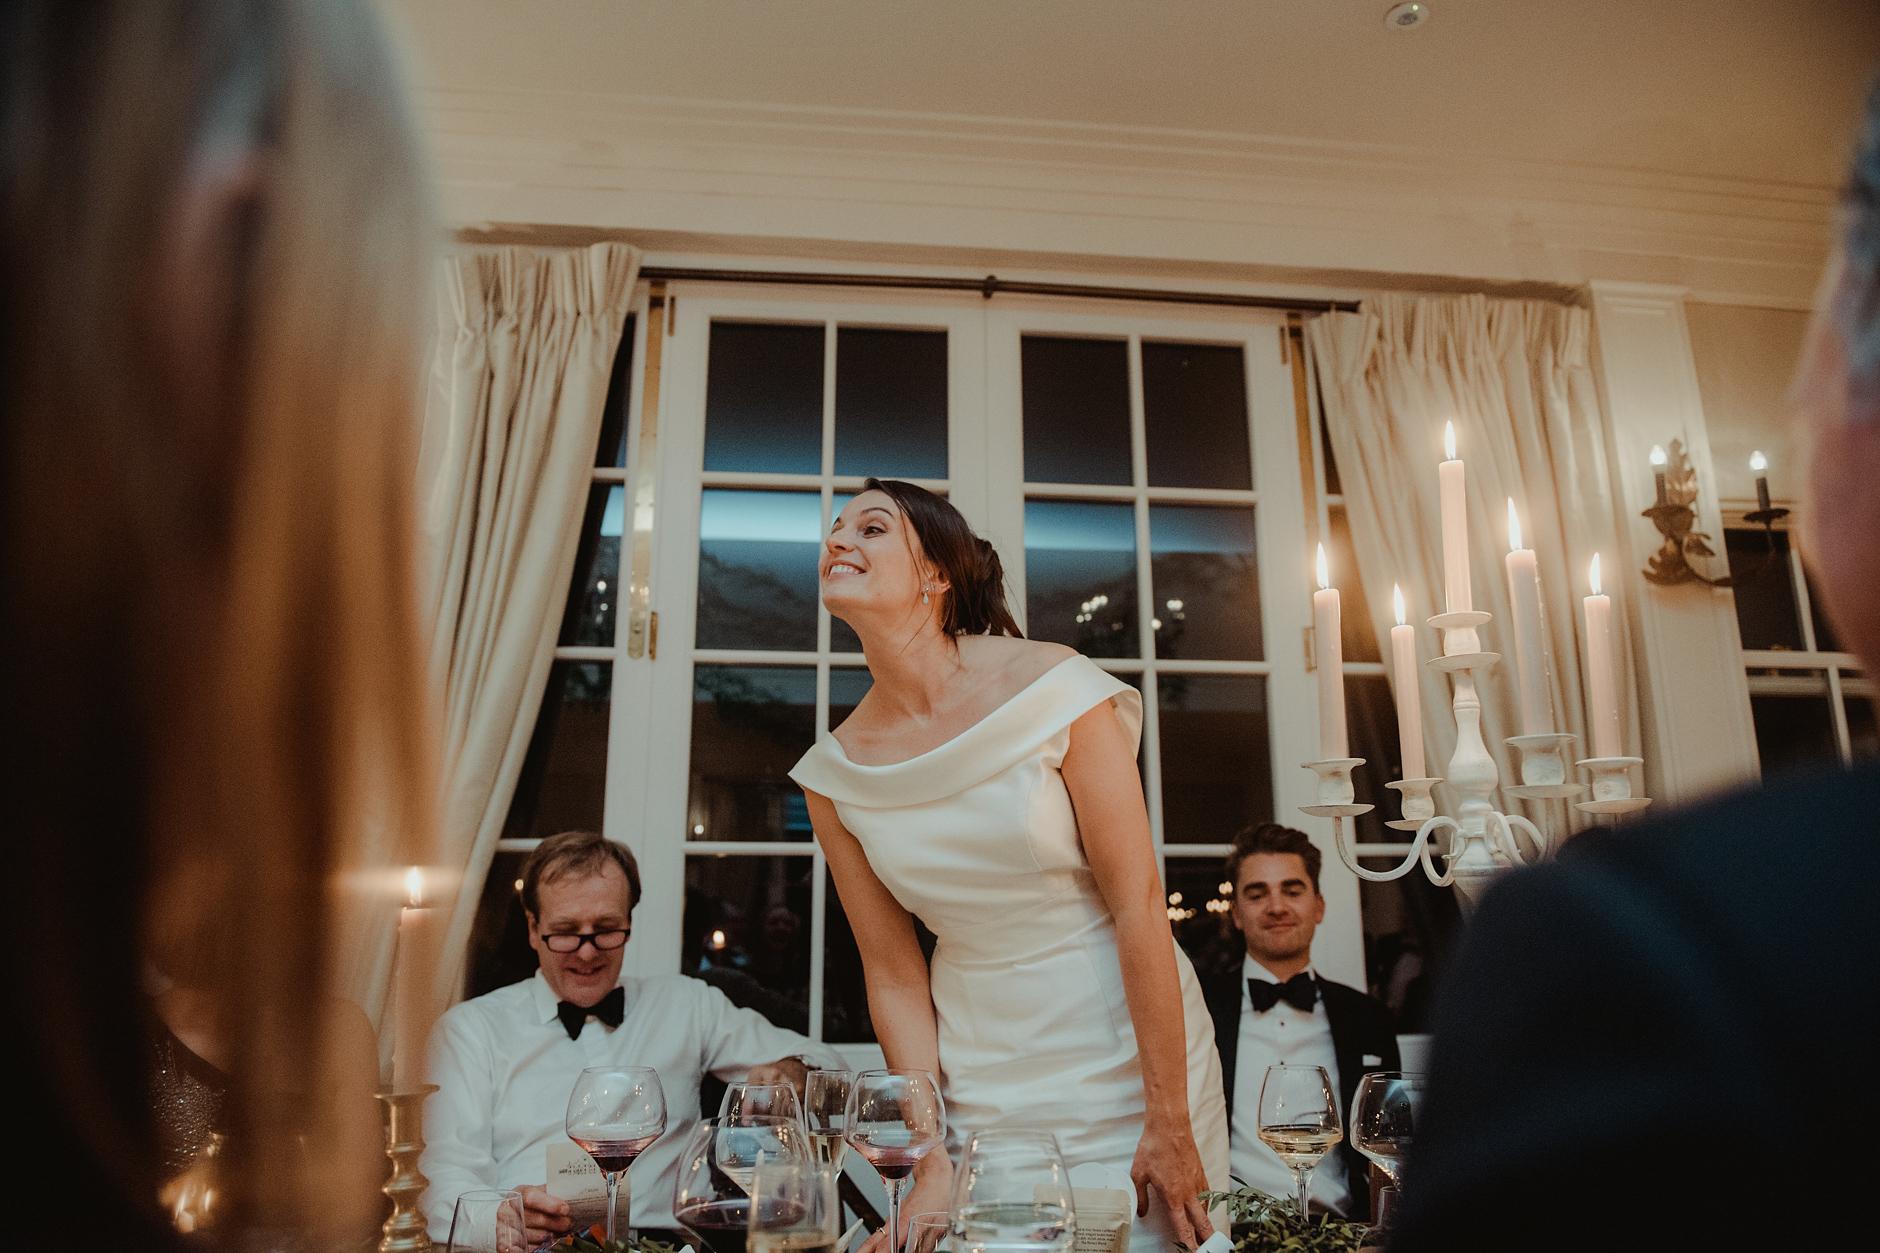 Glentruim-Wedding-Nikki-Leadbetter-Photography-331.jpg